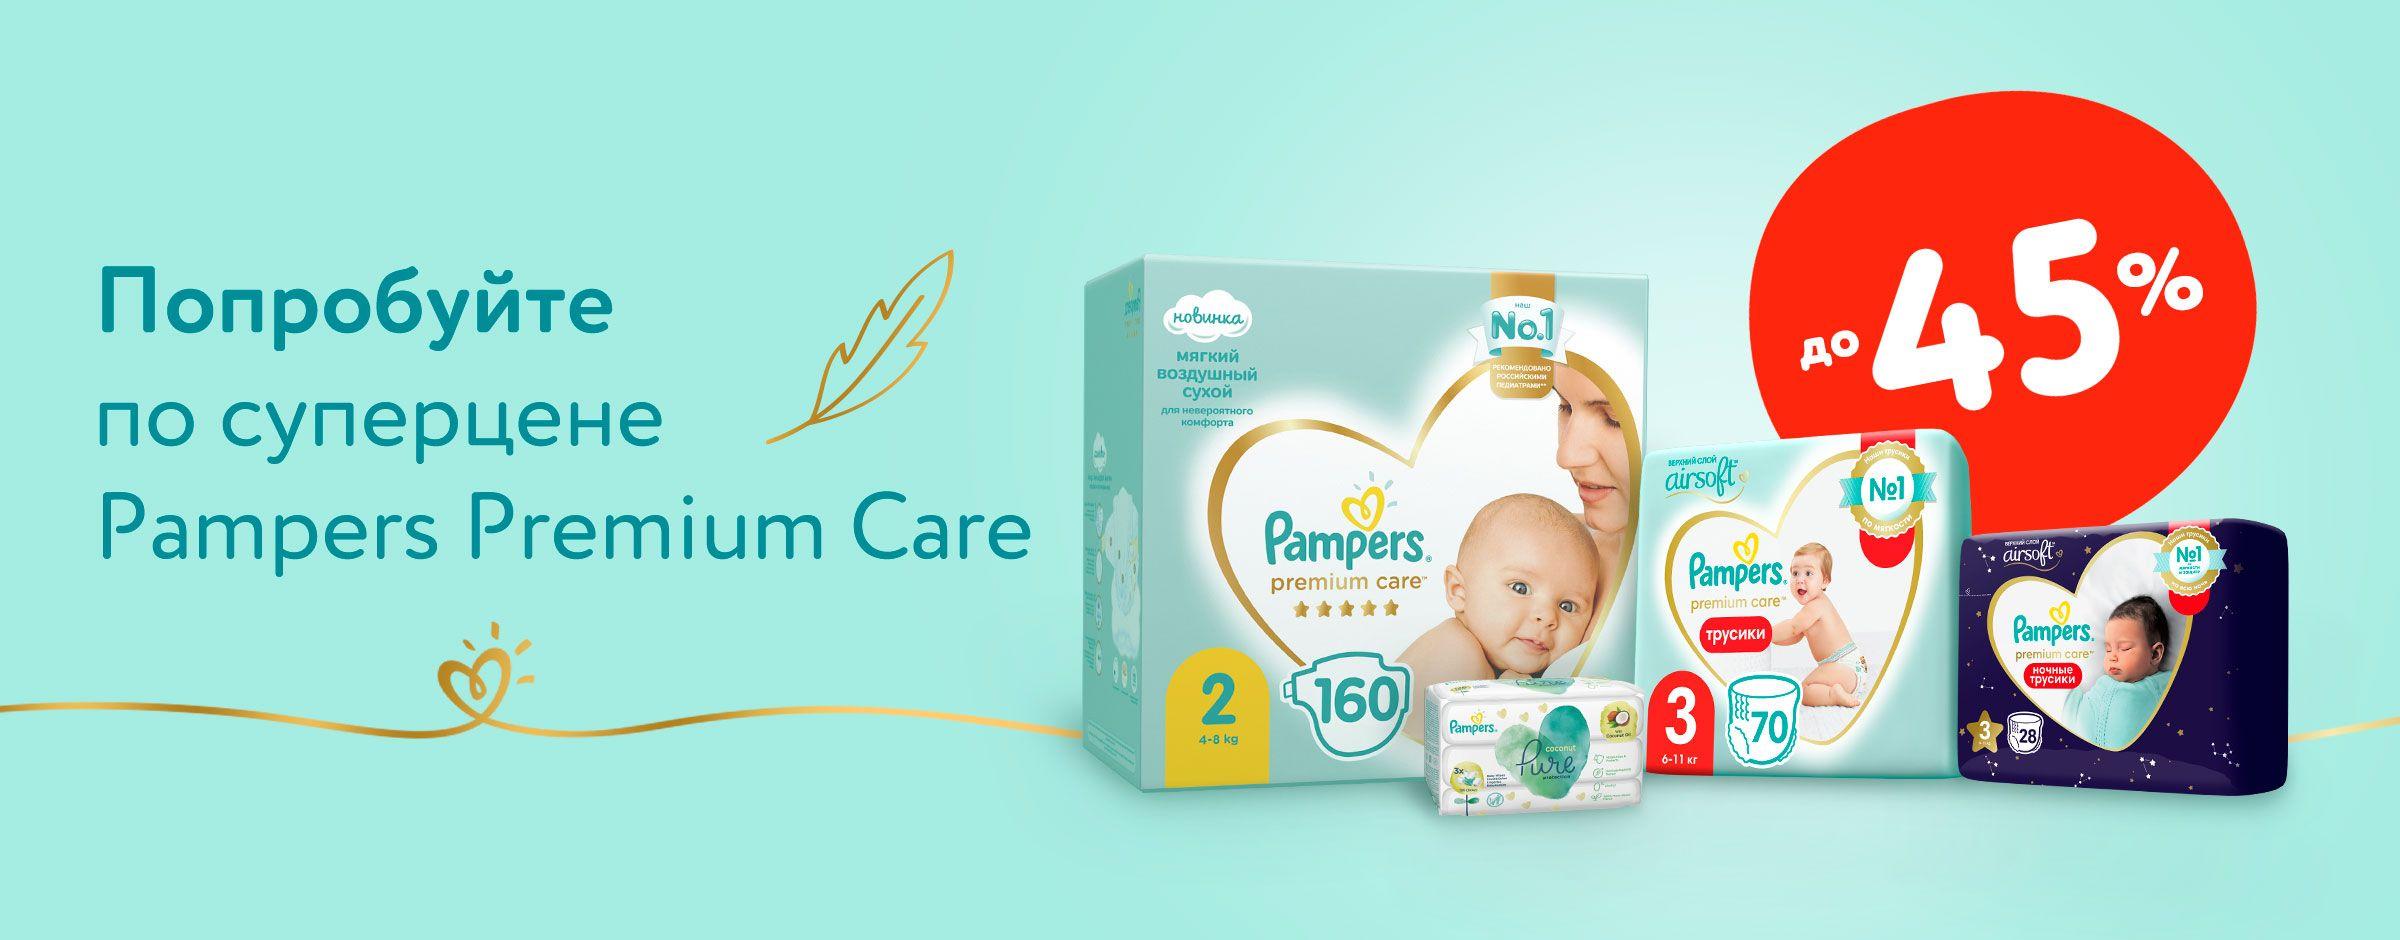 Pampers Premium Care статика 1